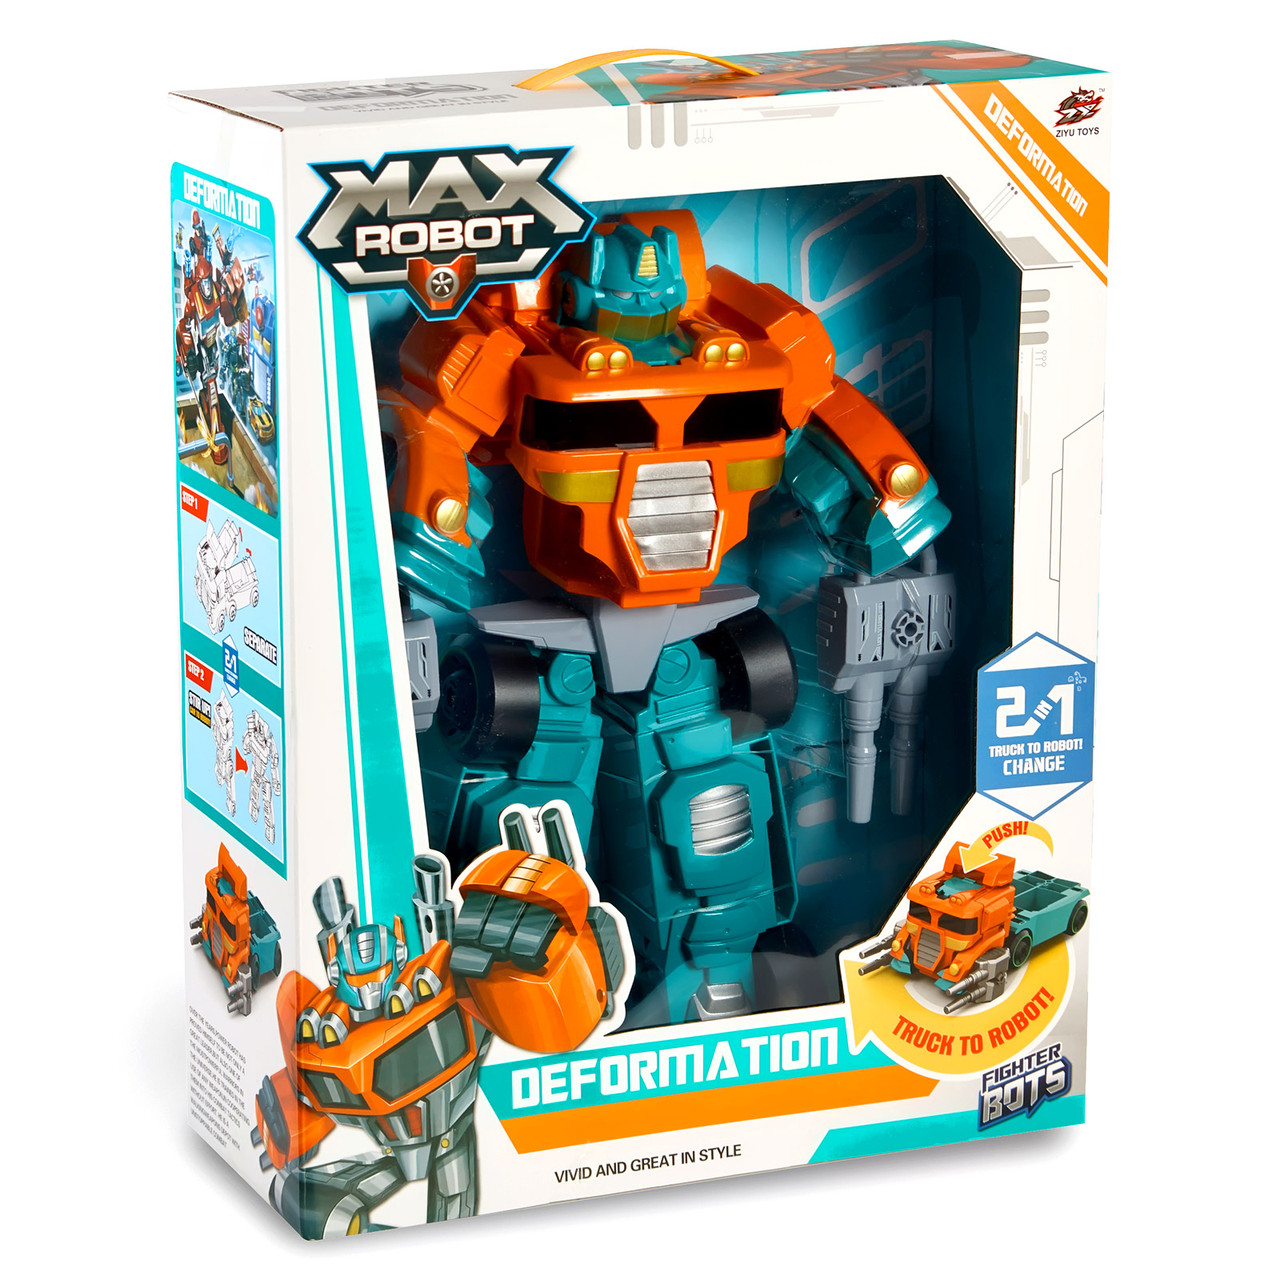 Робот-трансформер з кулеметами Max.Електро-робот